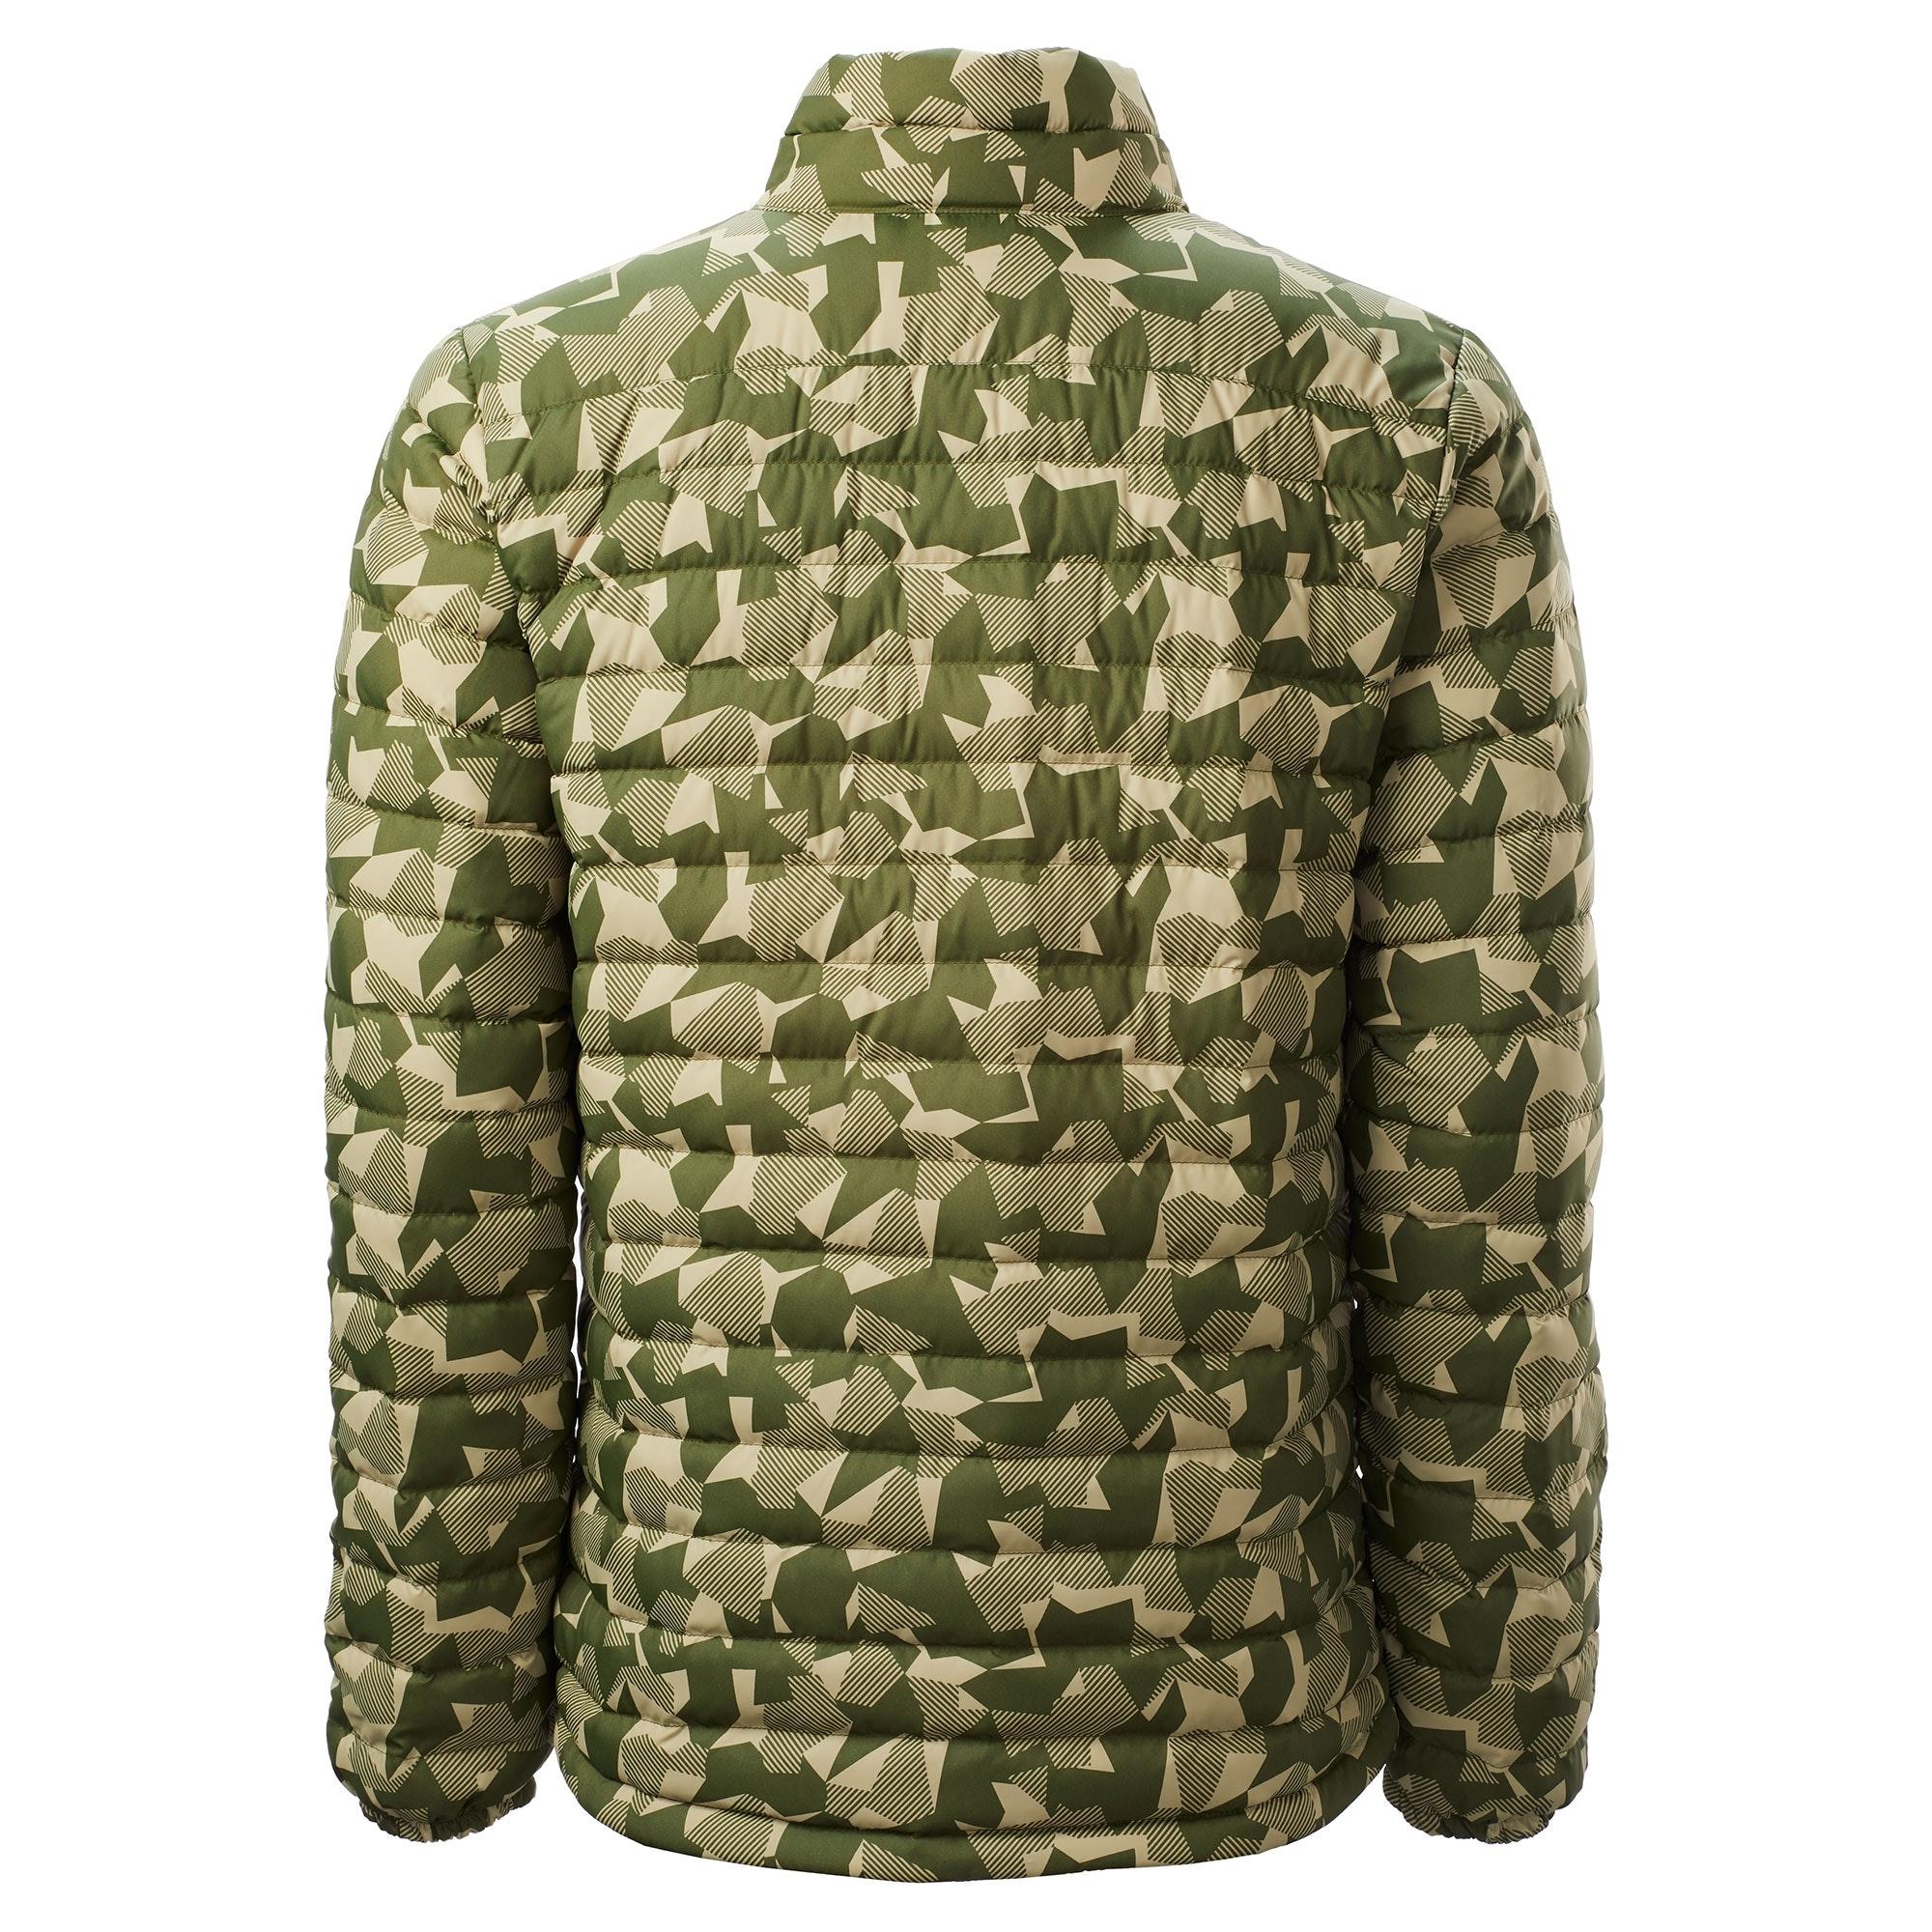 NEW-Kathmandu-Heli-Men-039-s-Lightweight-Duck-Down-Coat-Warm-Puffer-Jacket-v2